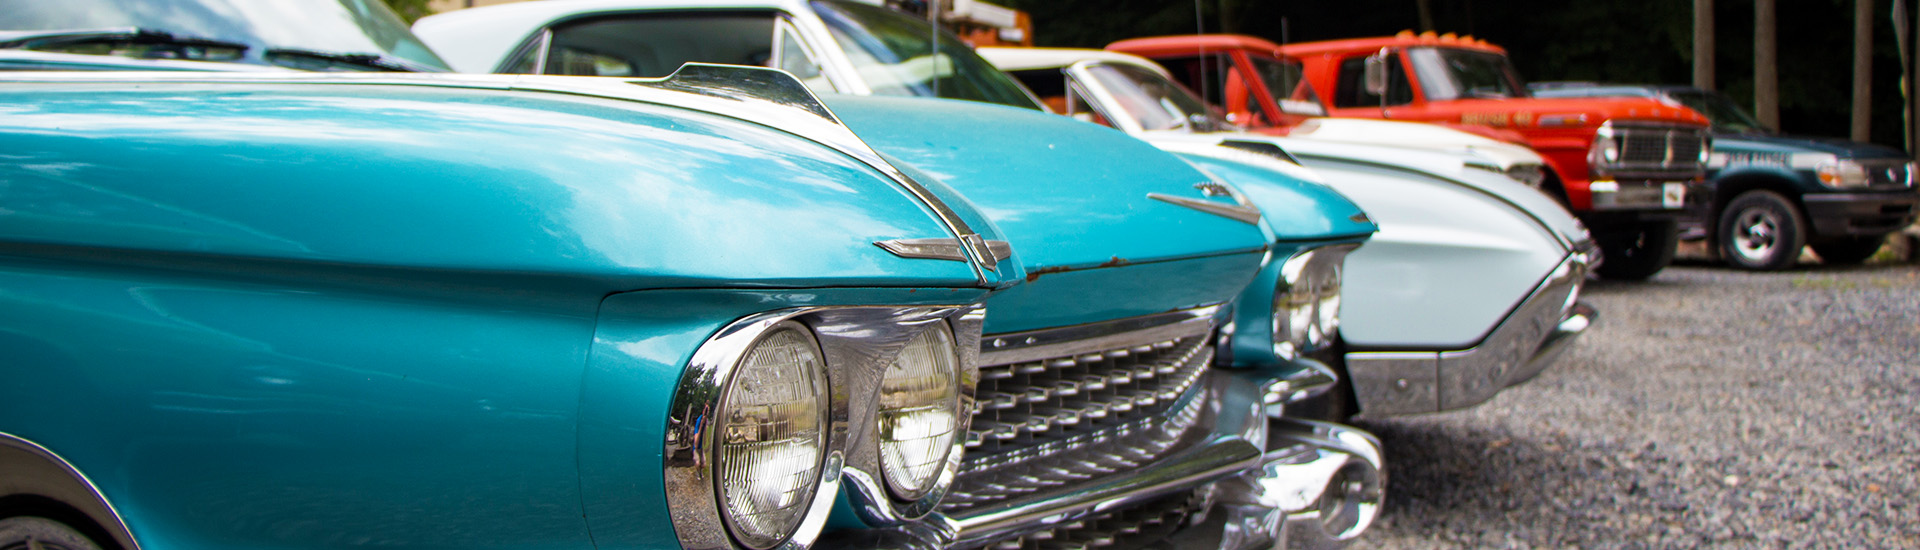 Classic Car Garage | Blue Rocks Family Campground